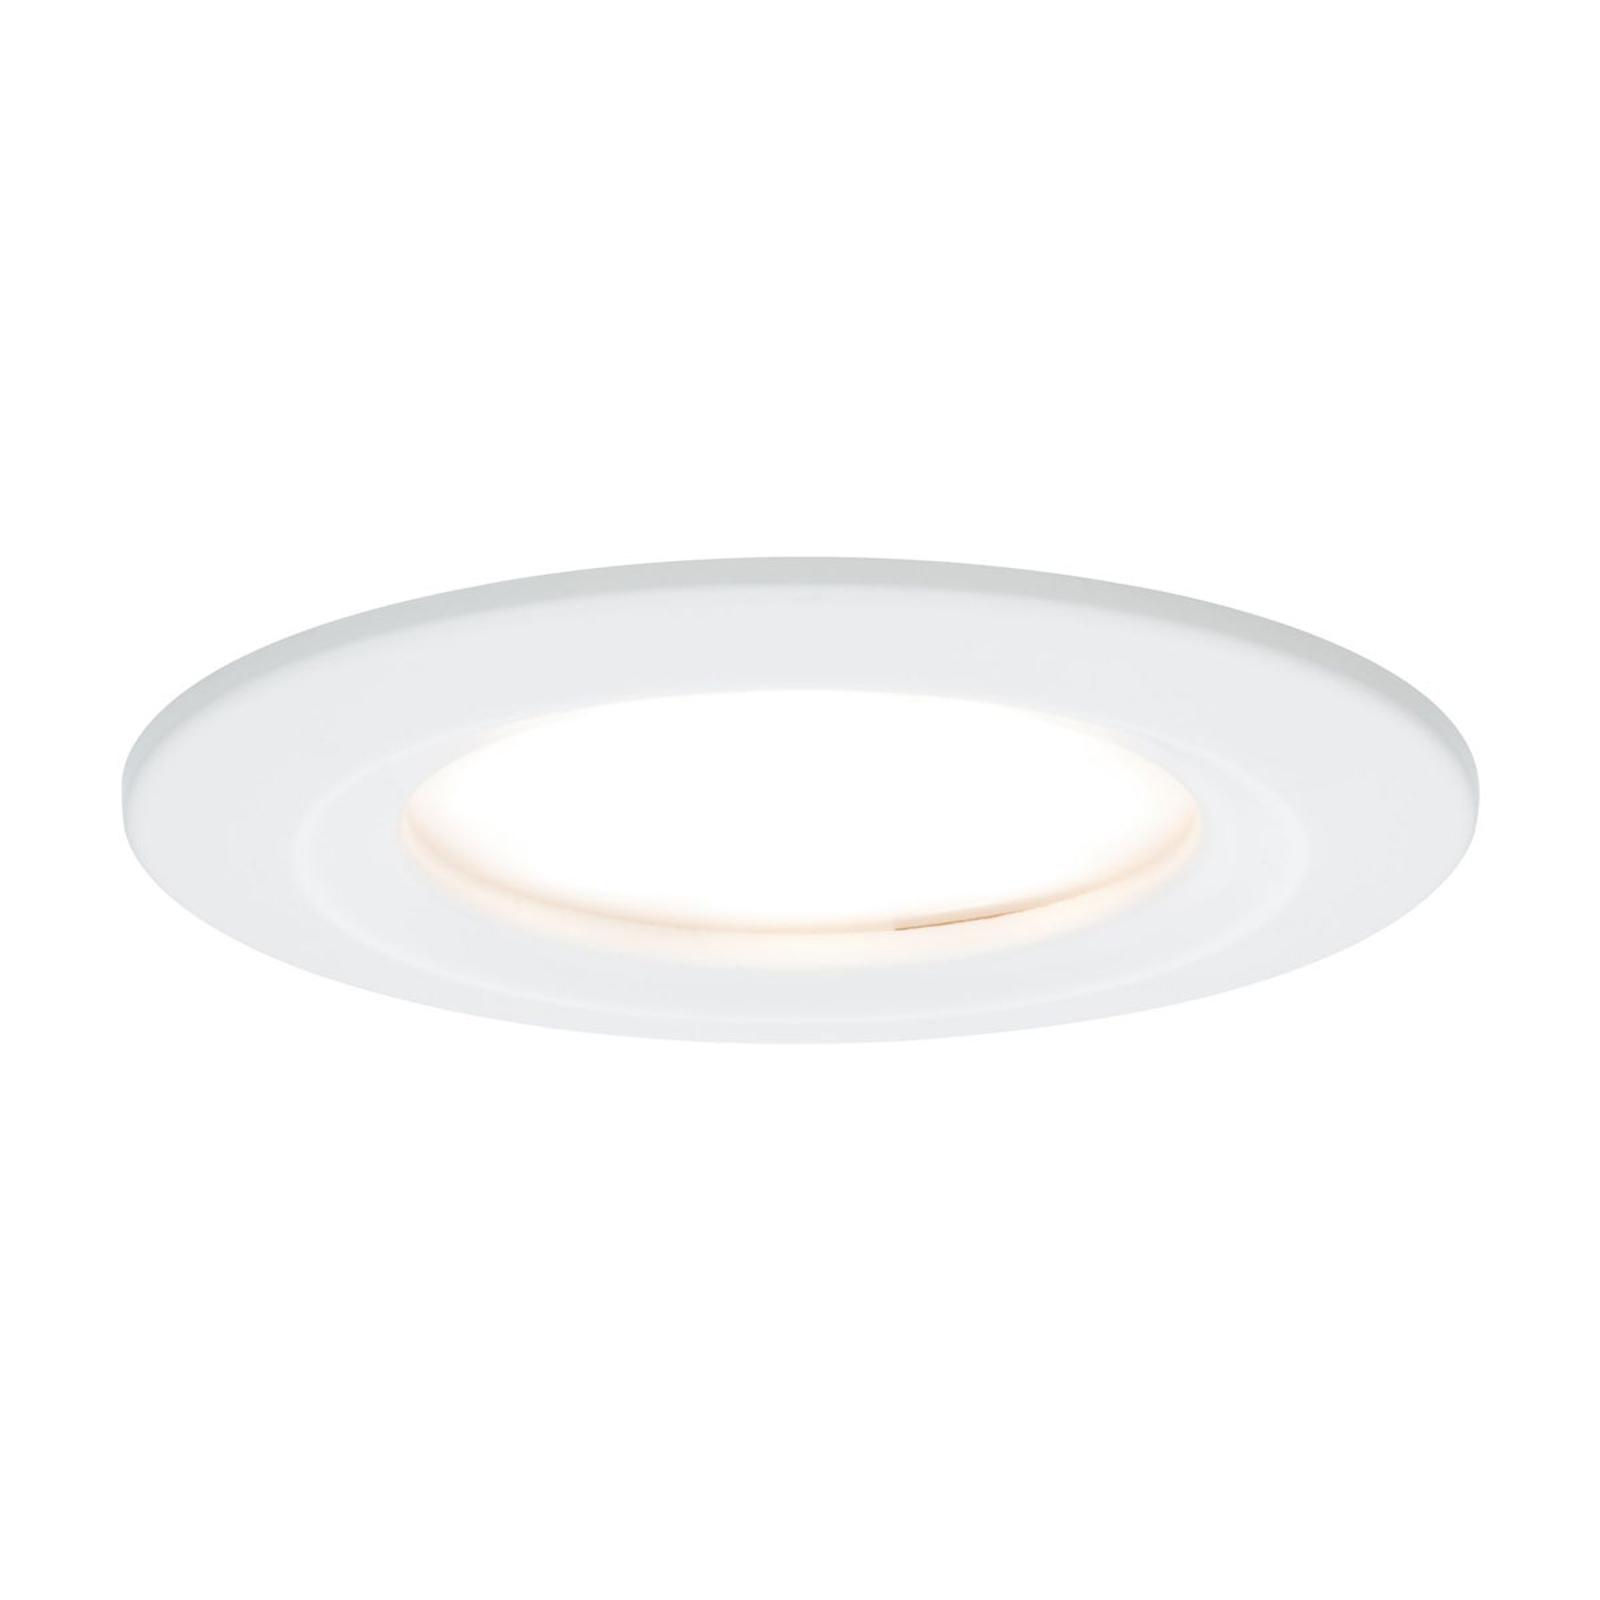 Paulmann LED-spot Nova Coin rund, dimbar, vit